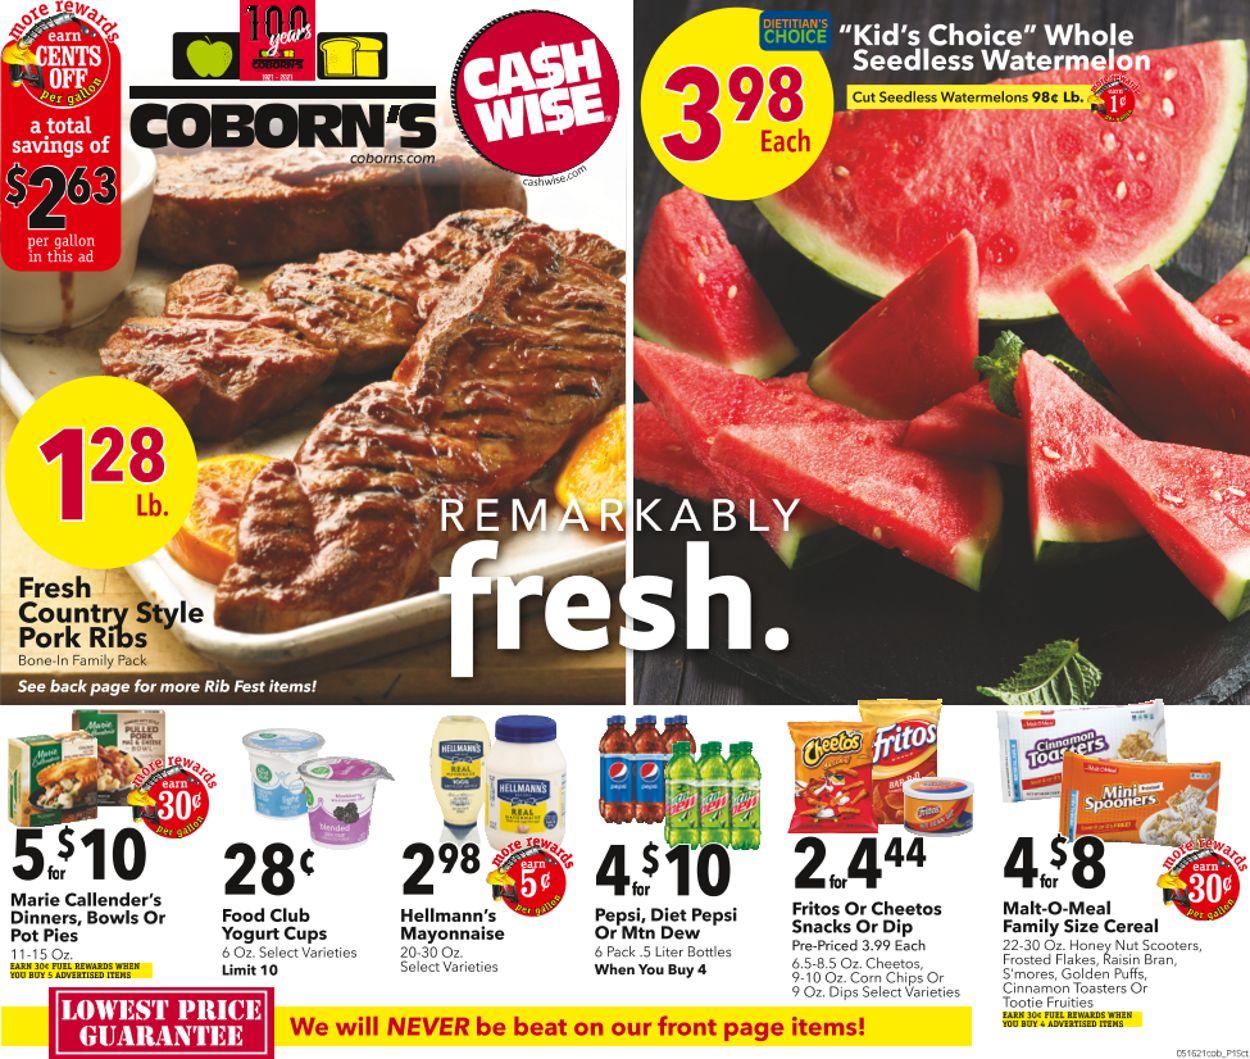 Cash Wise Weekly Ad Circular - valid 05/19-05/25/2021